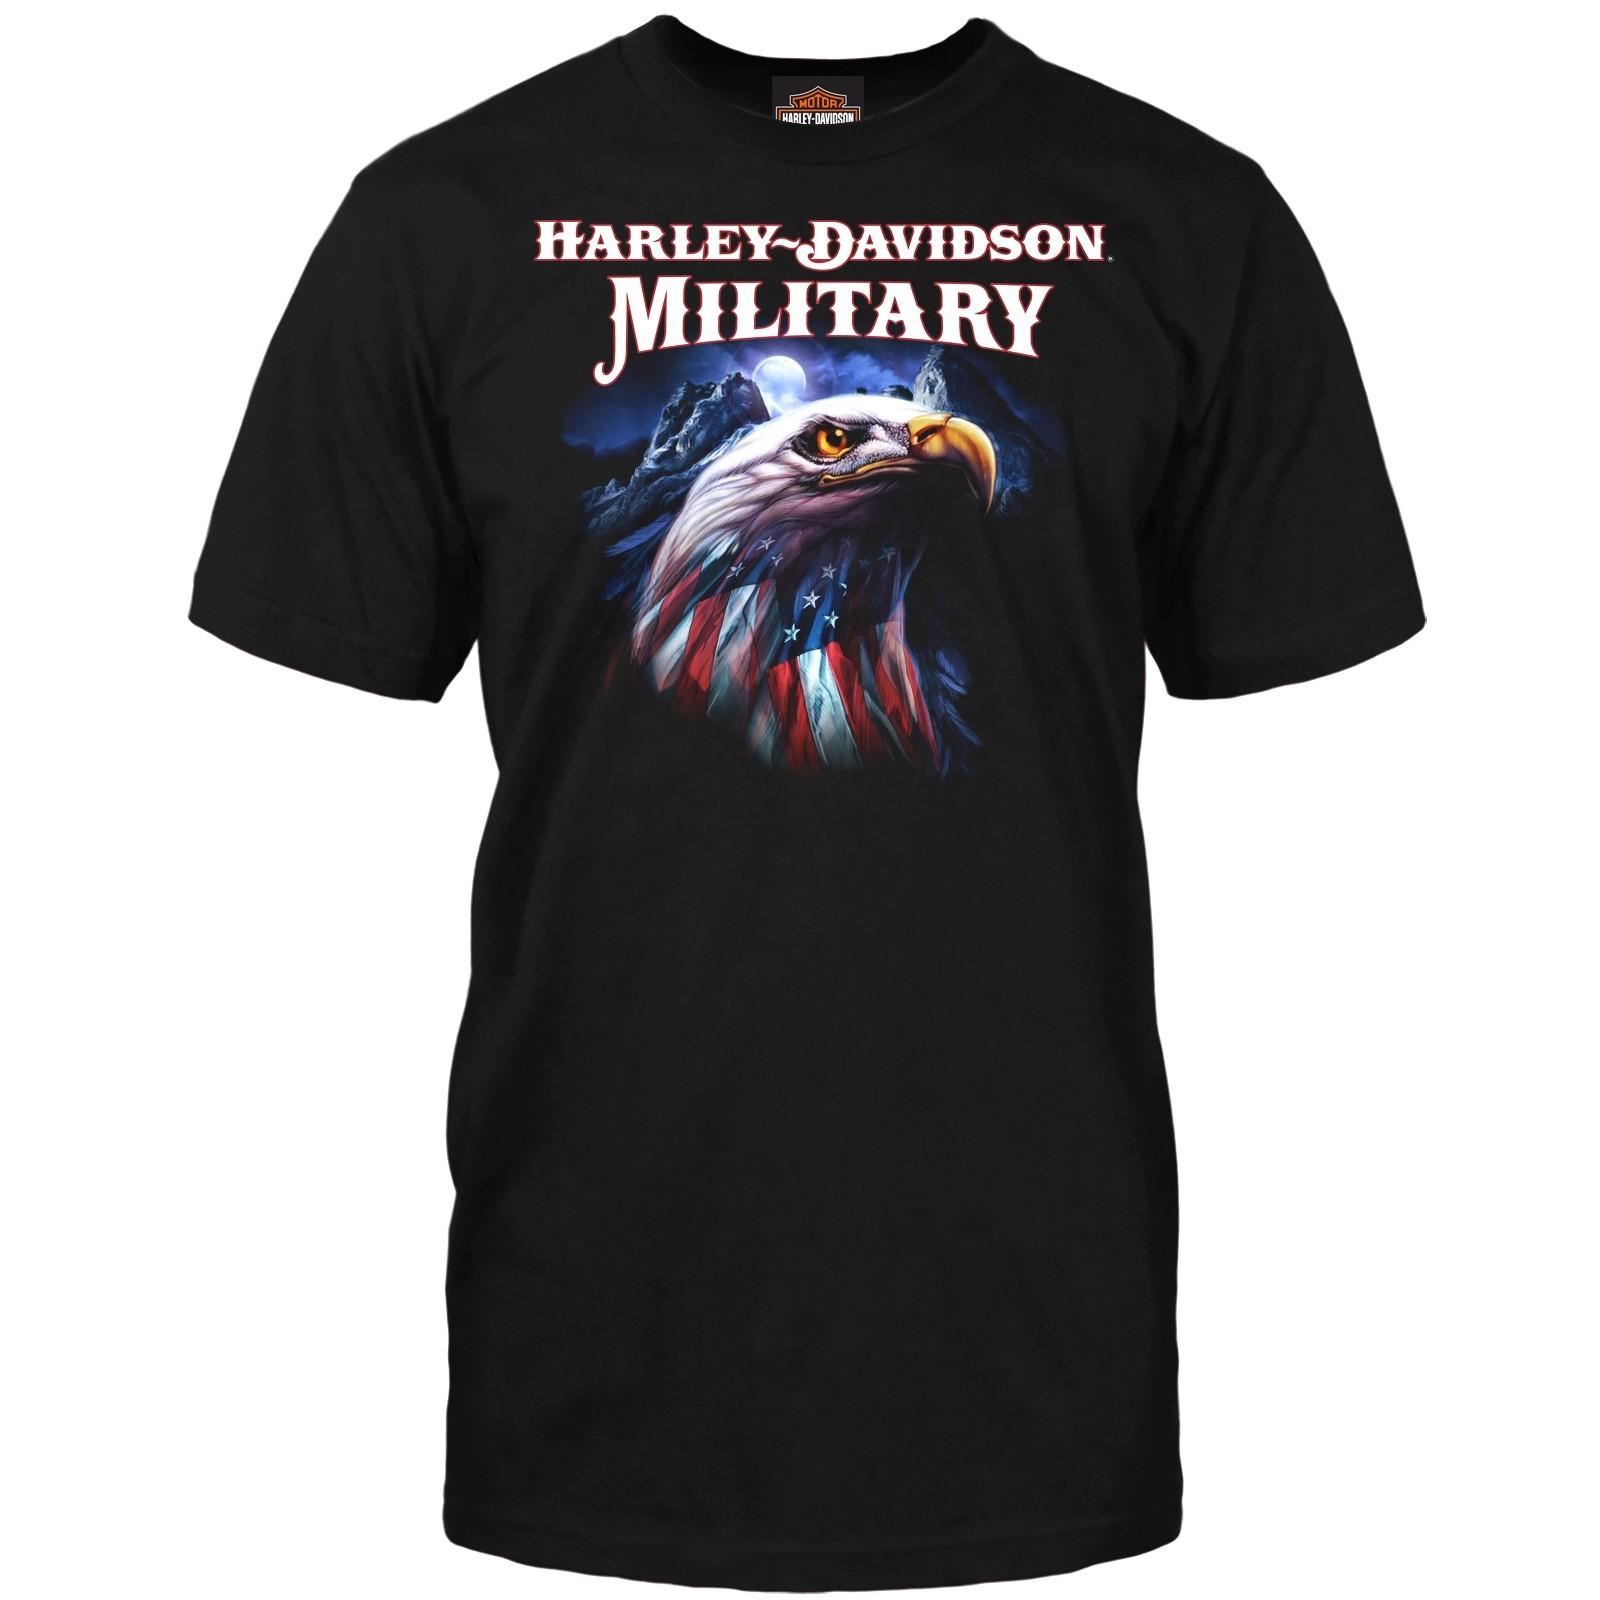 Harley-Davidson Men's Graphic Short-Sleeve T-Shirt - Overseas Tour   Patriot Eagle